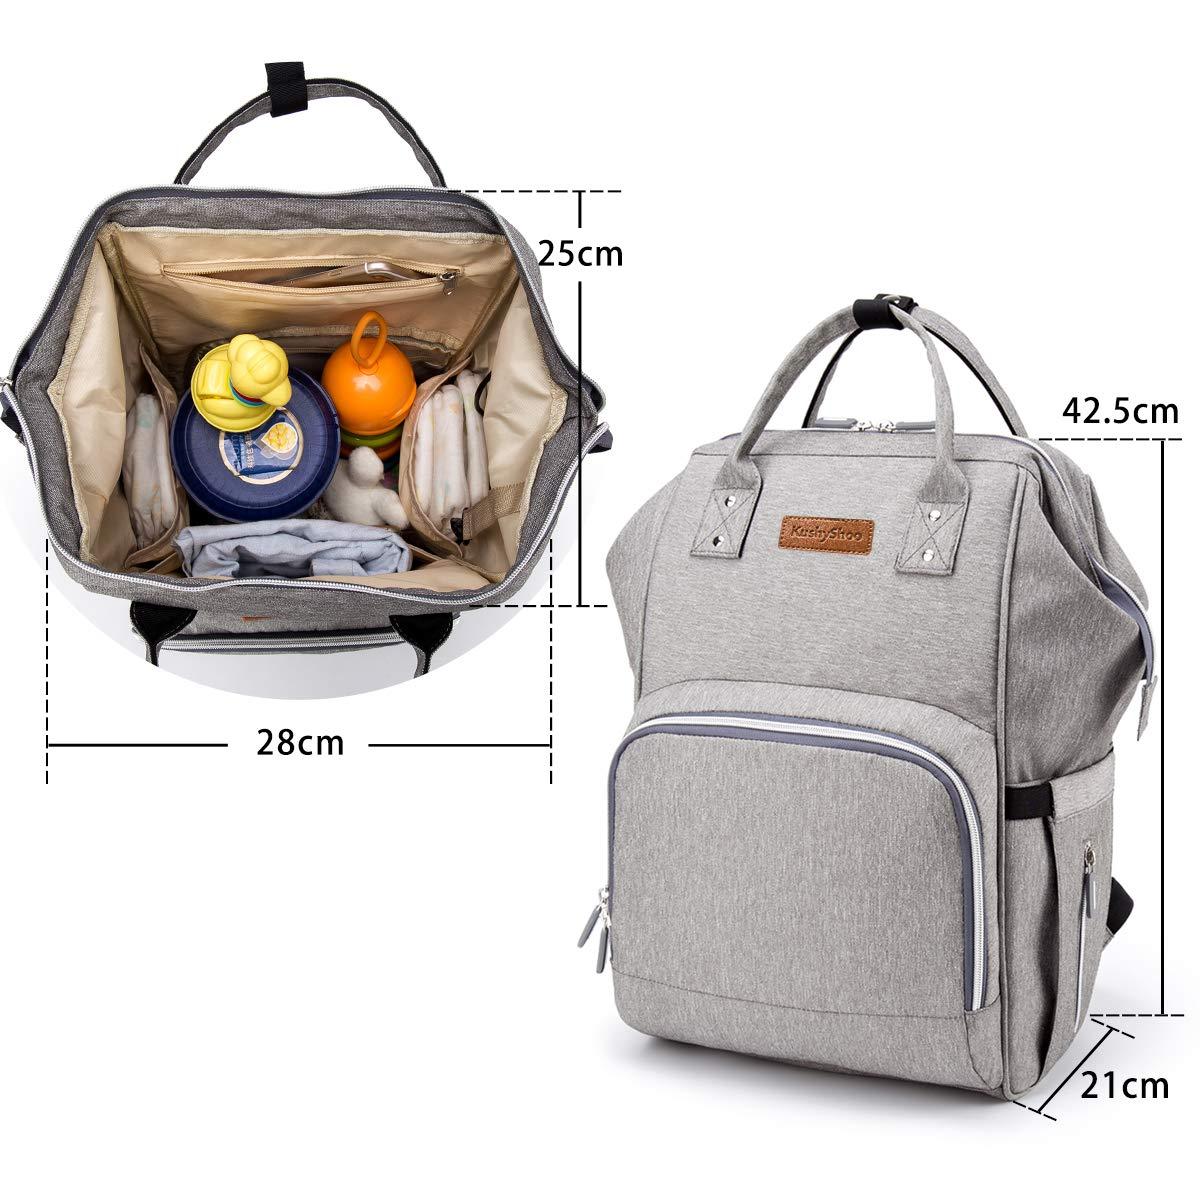 Wasserdicht Gro/ße Kapazit/ät Baby Wickelrucksack Wickeltasche mit Wickelunterlage USB-Lade Port 2 Kinderwagen-haken Multifunktional